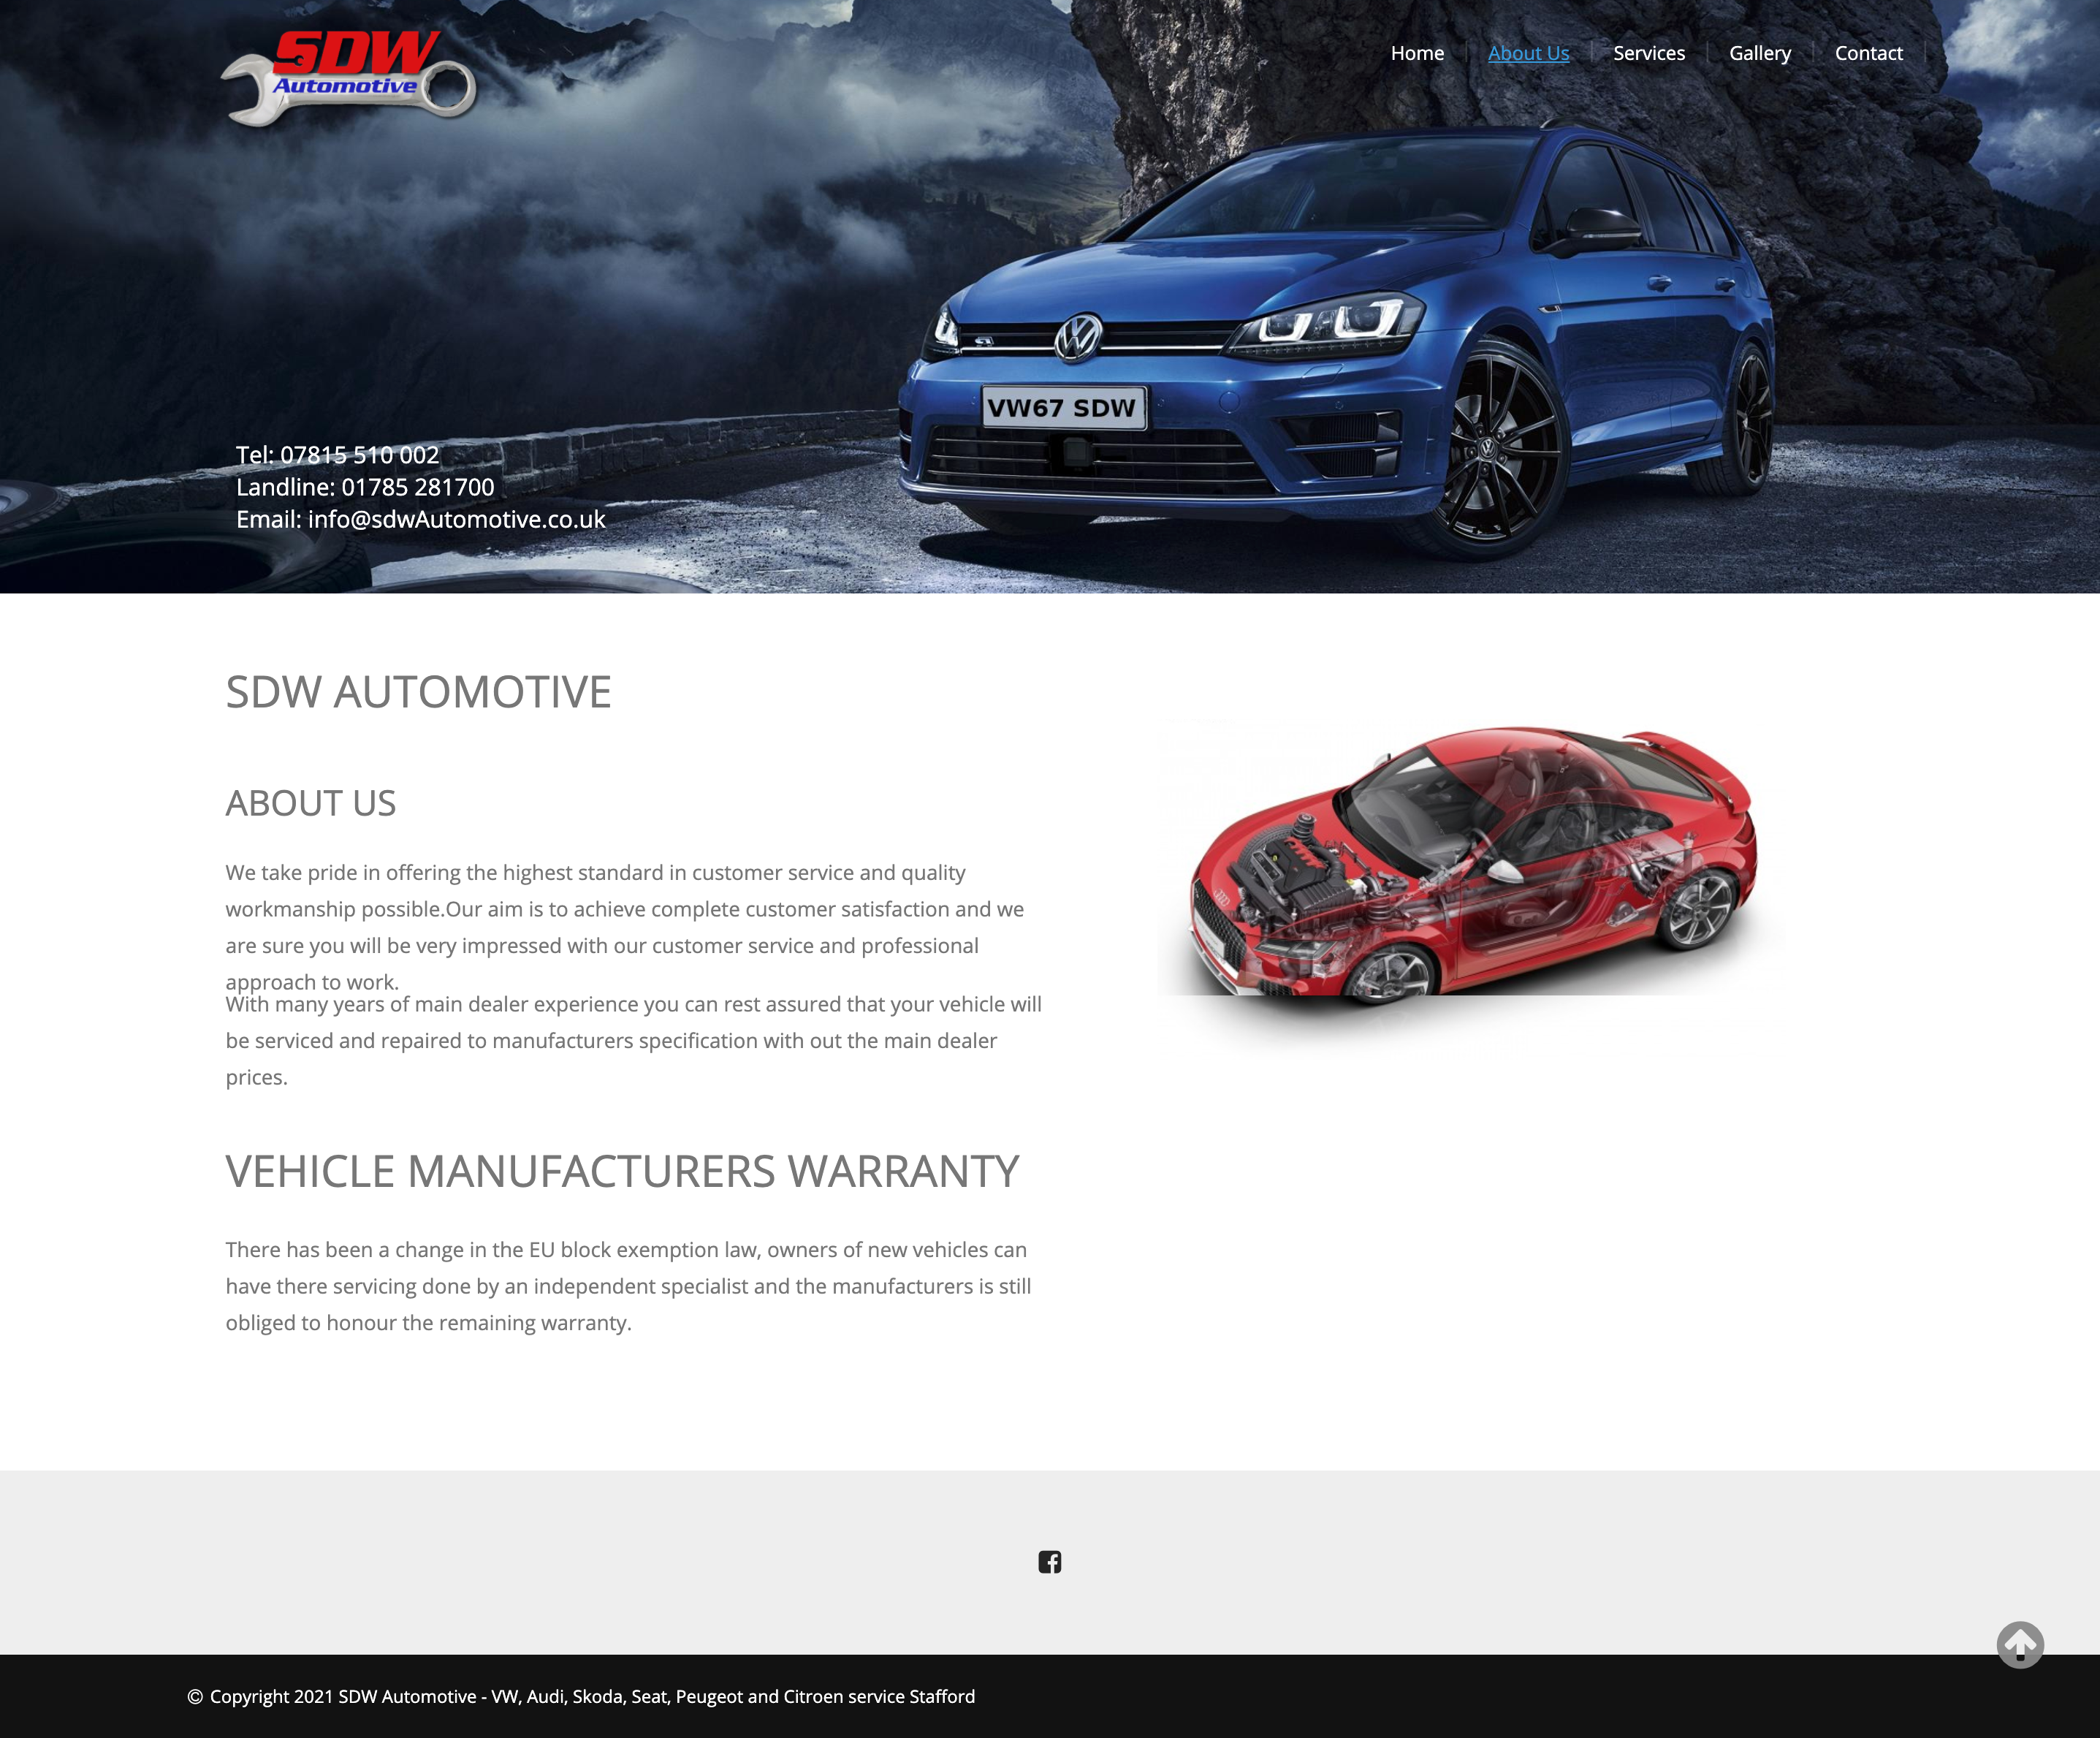 New services design